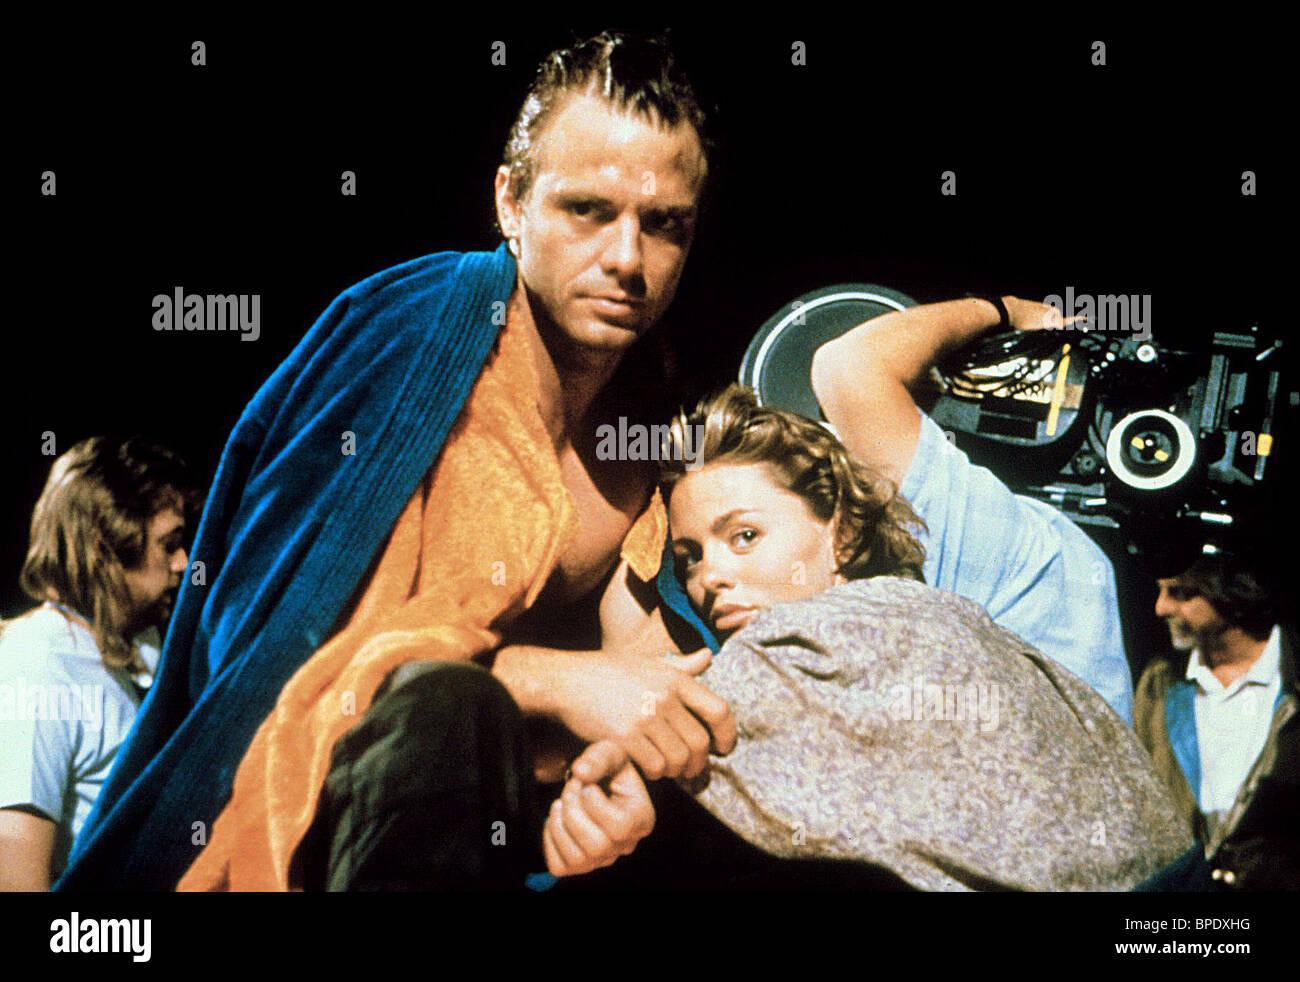 MICHAEL BIEHN & PATSY KENSIT TIMEBOMB (1991) - Stock Image